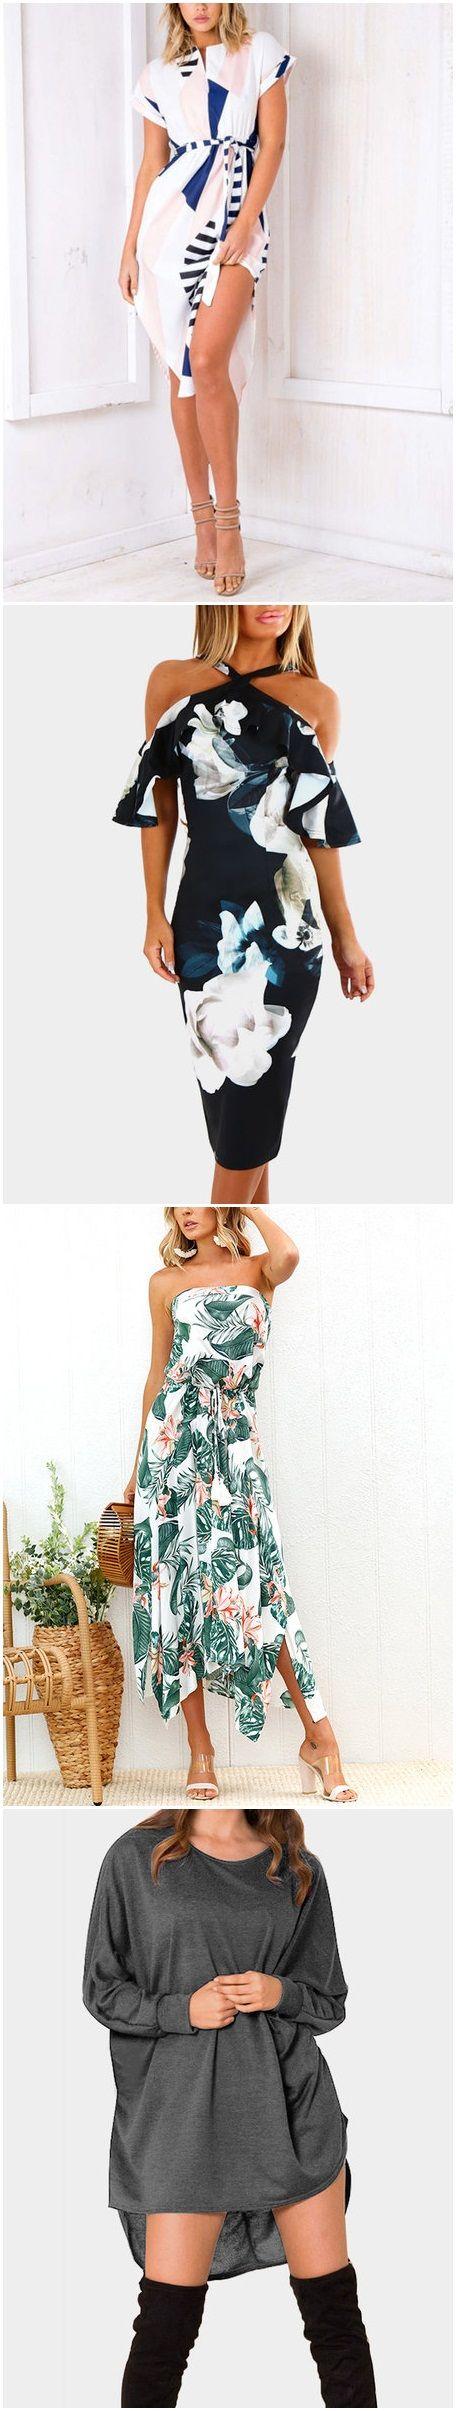 Pattern V-neck Short Sleeves Drawstring Waist Dress